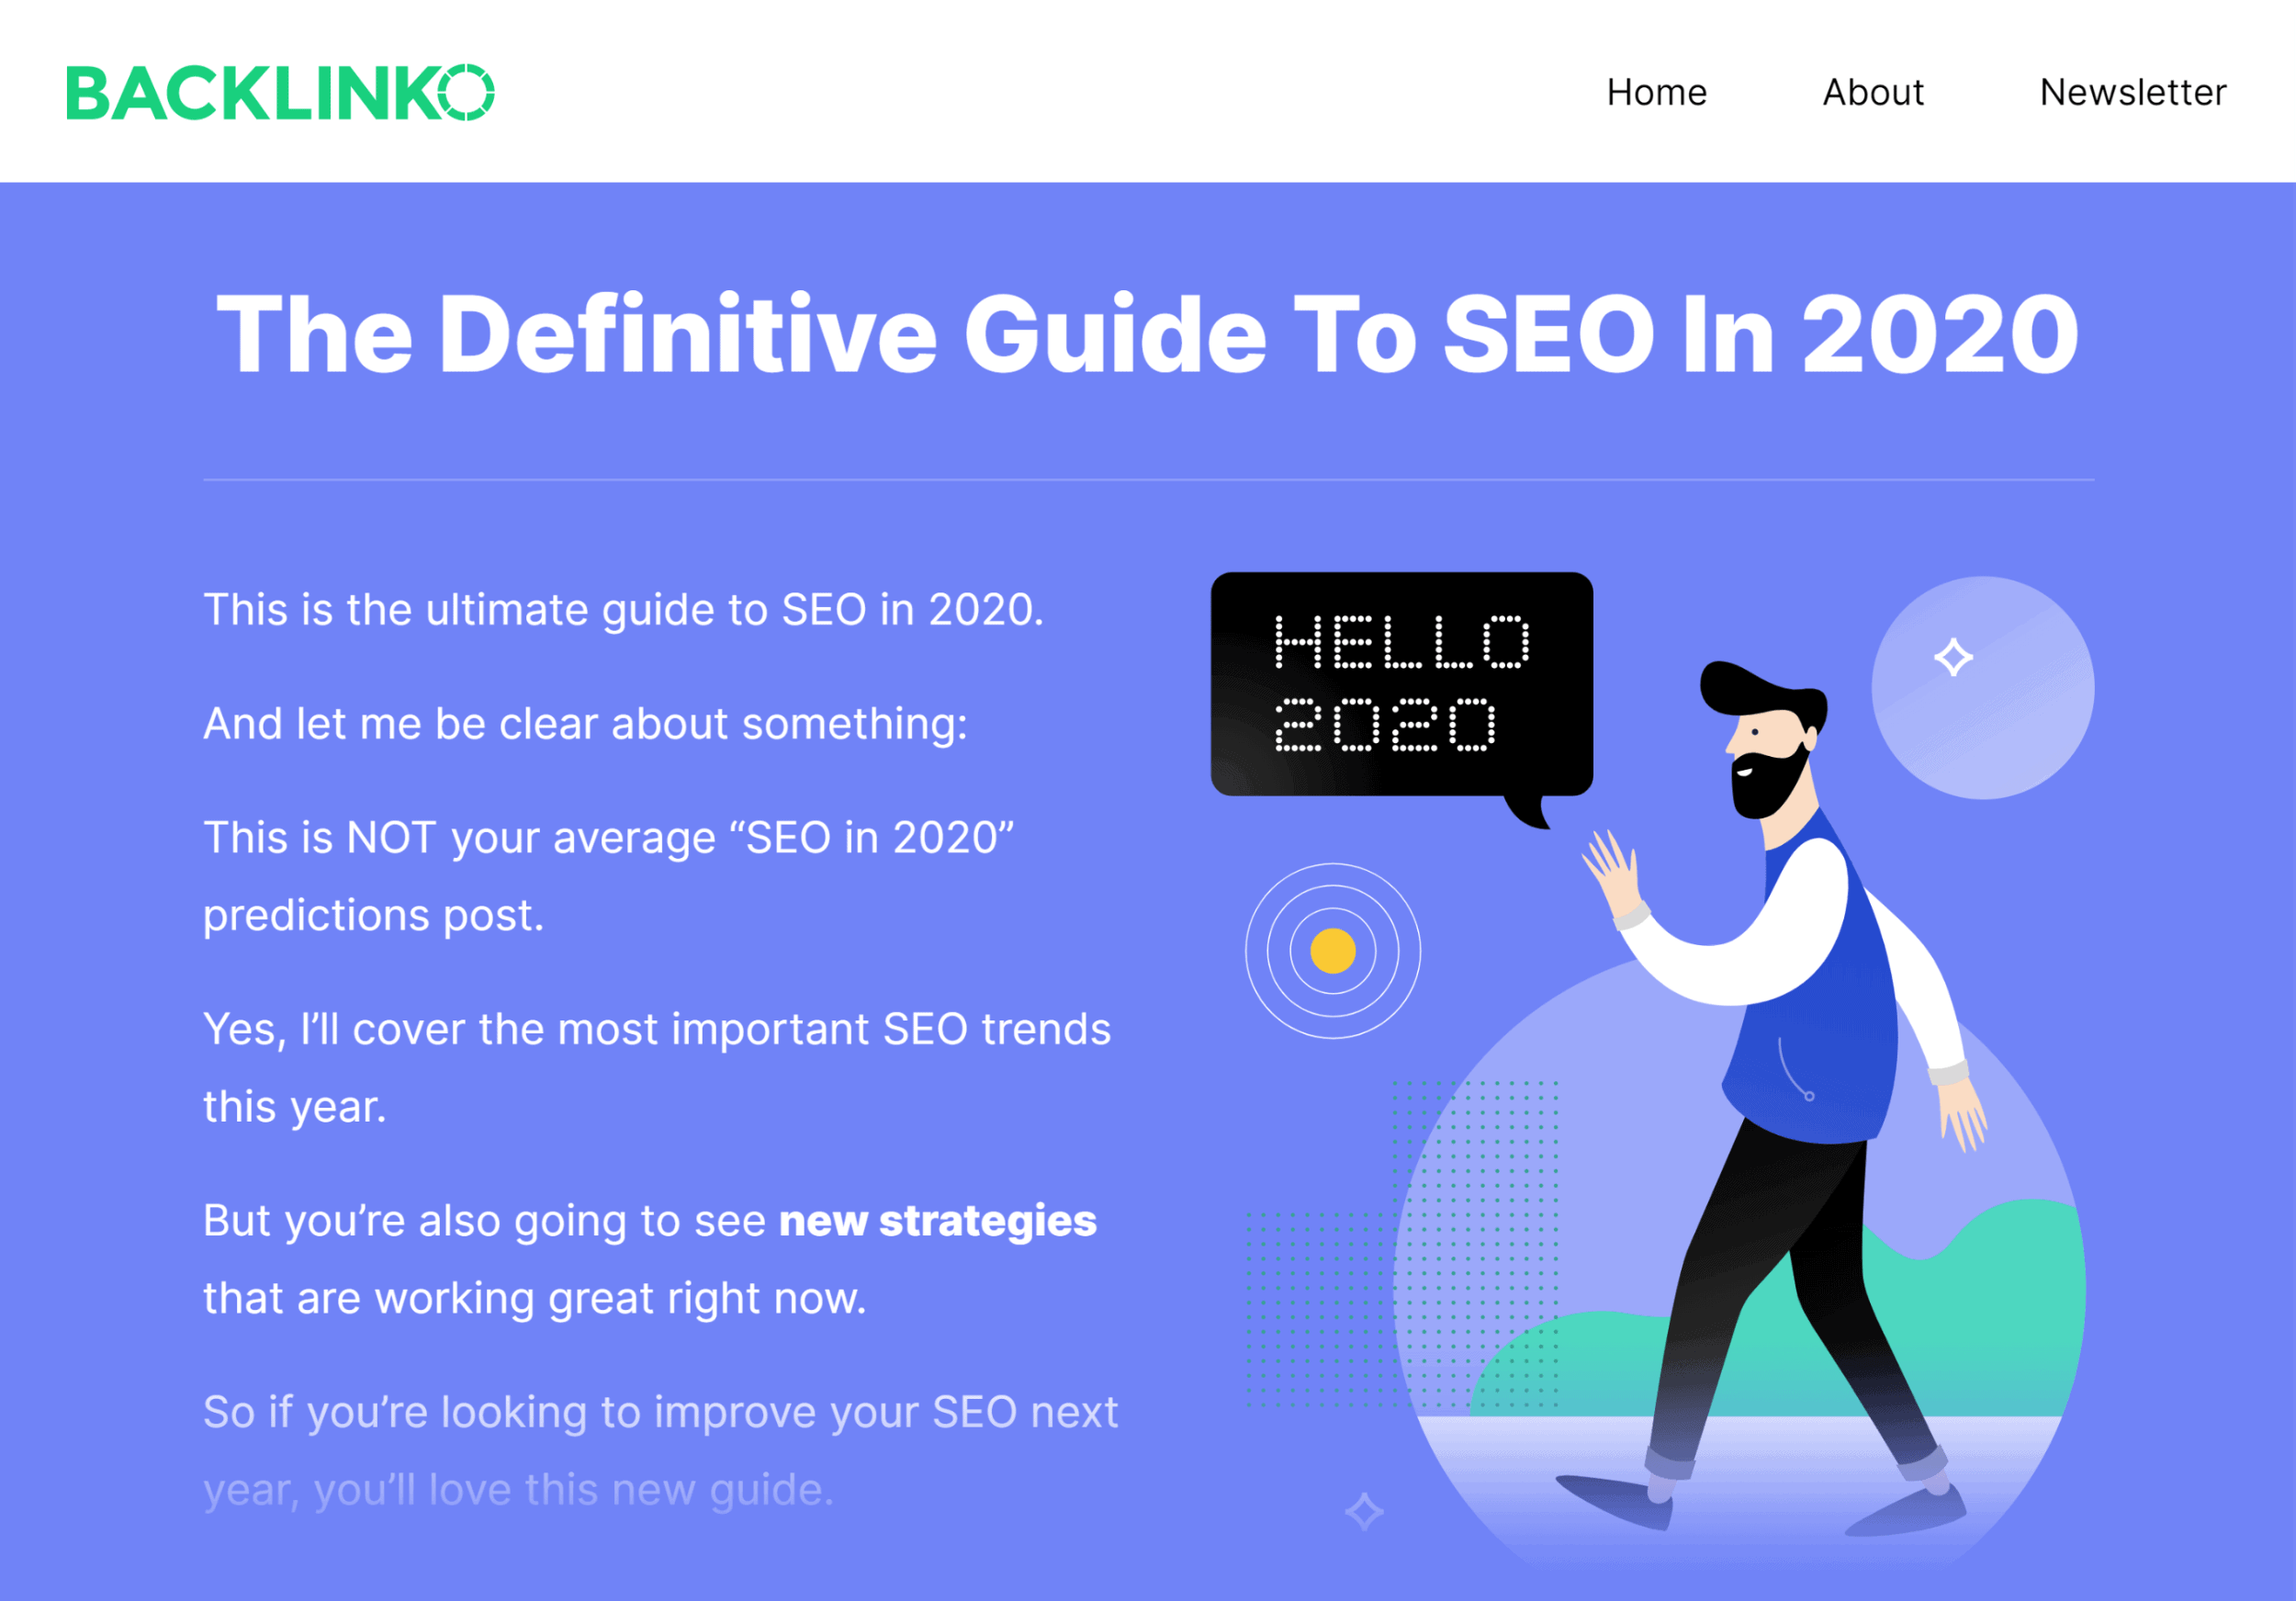 Backlinko – SEO this year guide